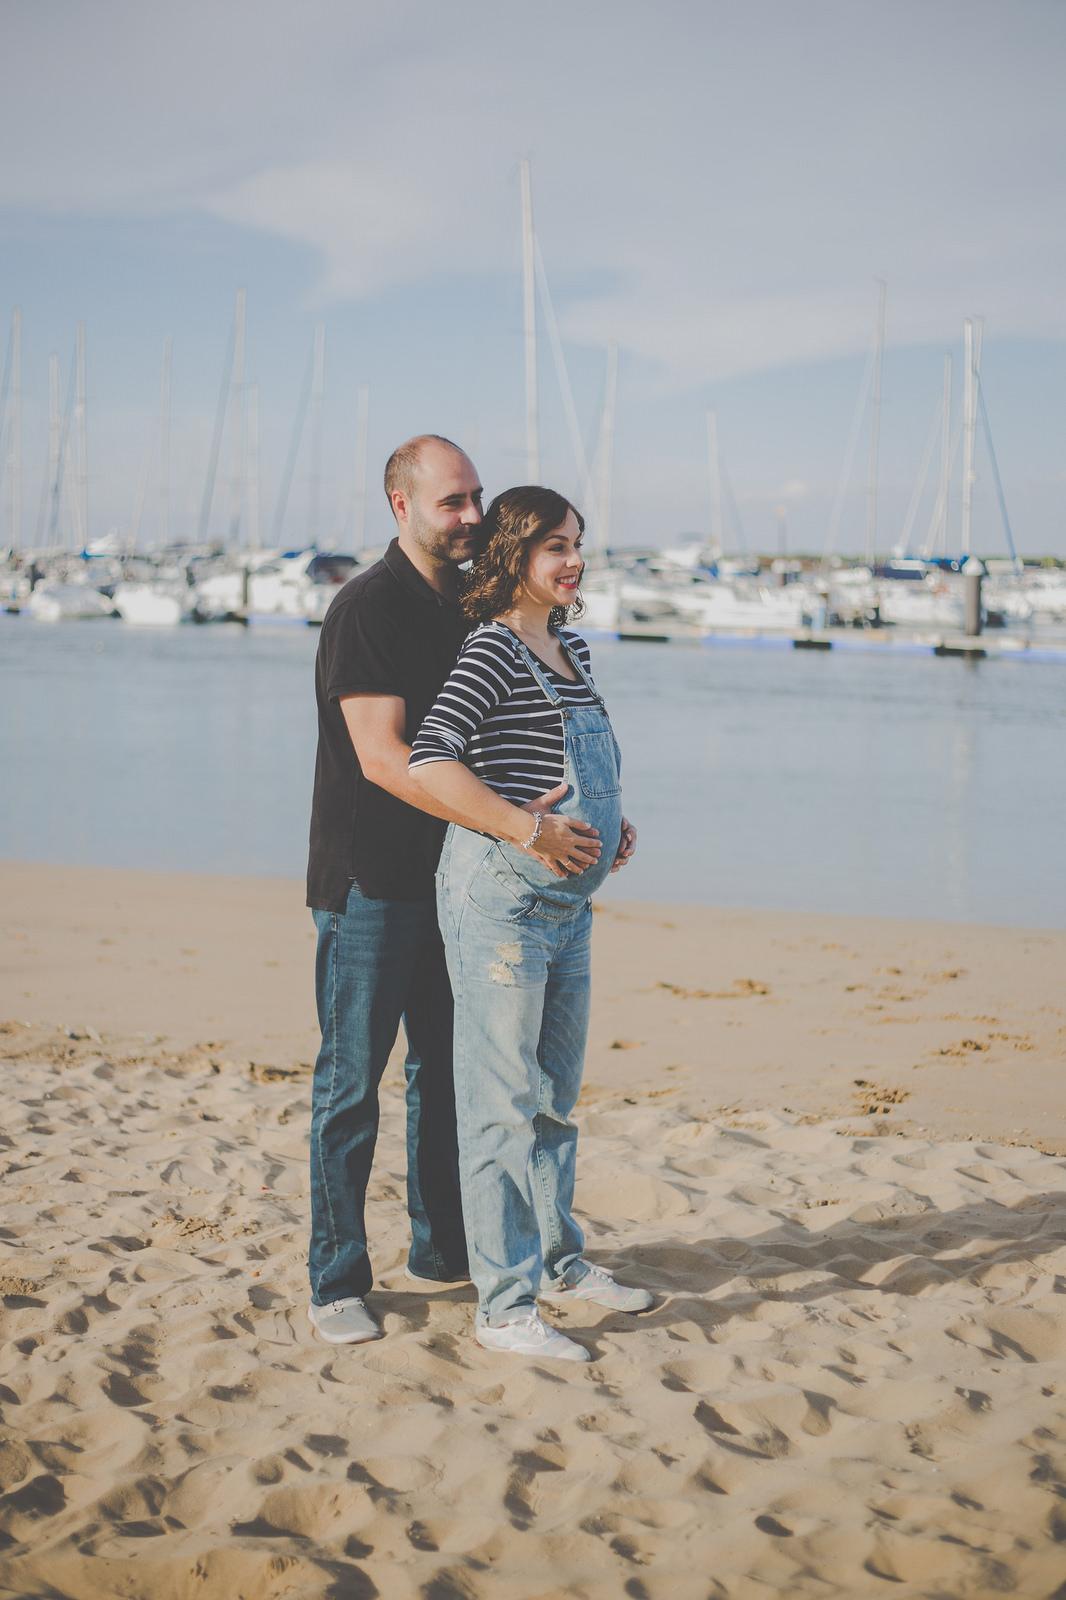 sesion embarazo silvia orduna fotografia huelva playa 5